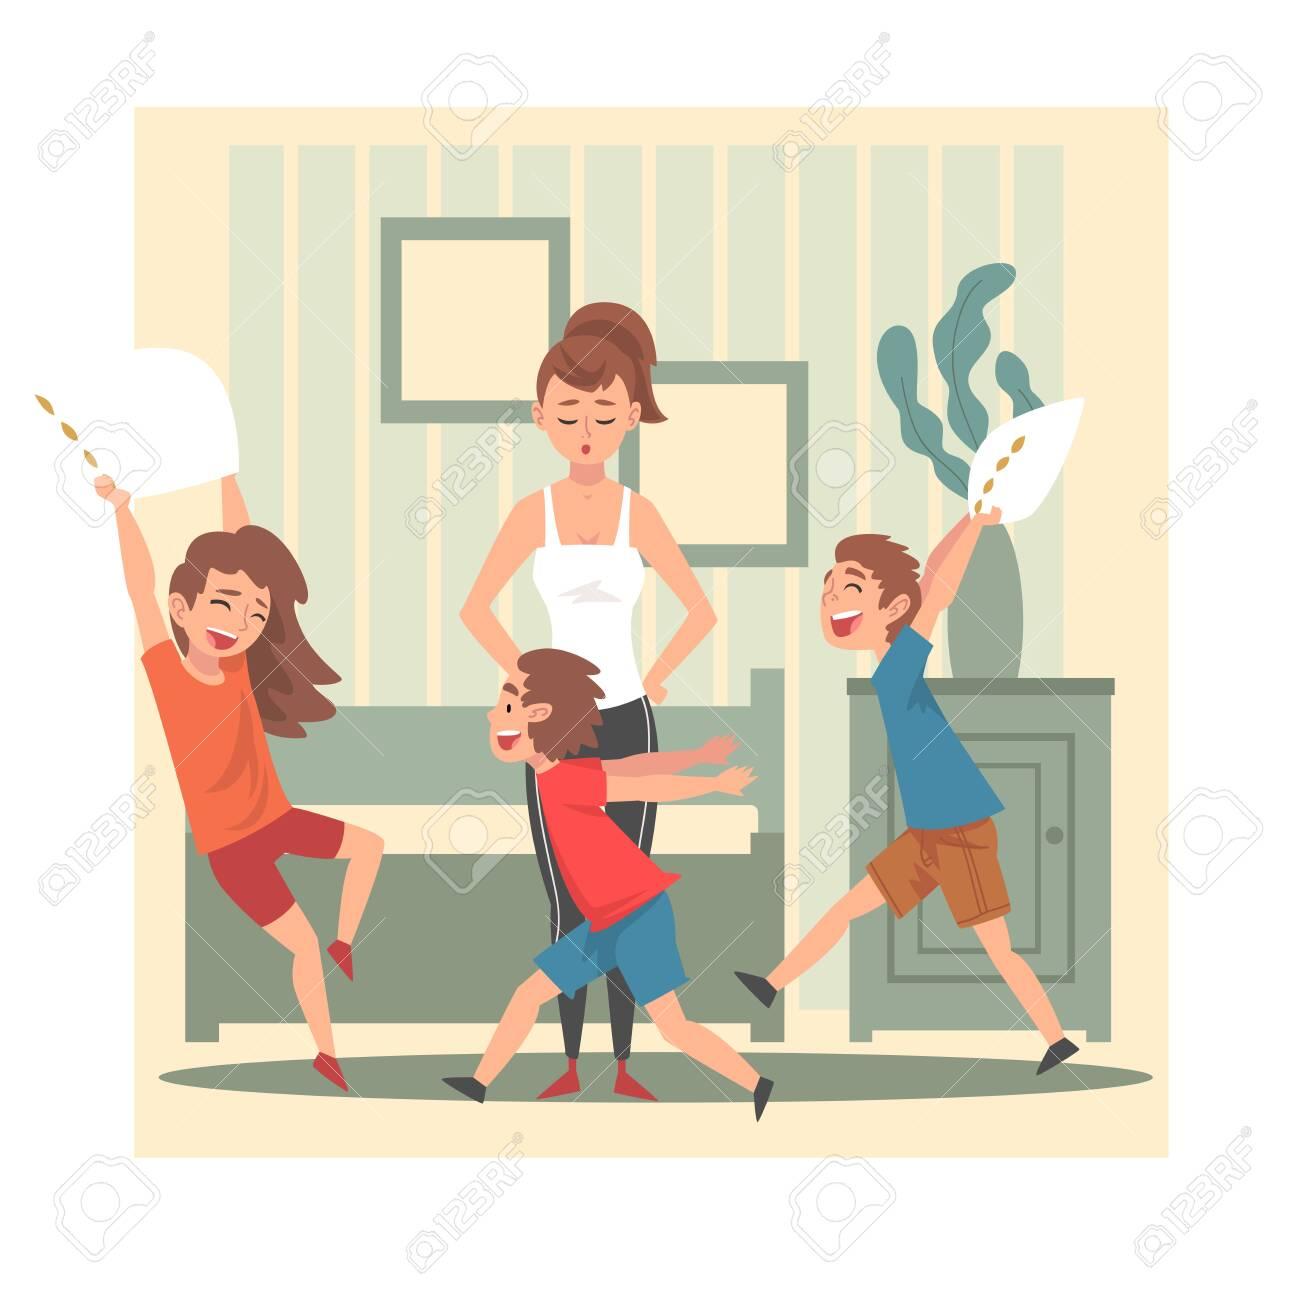 Mother and Her Mischievous Children, Kids Having Fun at Home, Naughty, Rowdy Children, Bad Child Behavior Vector Illustration, Flat Style. - 129148114